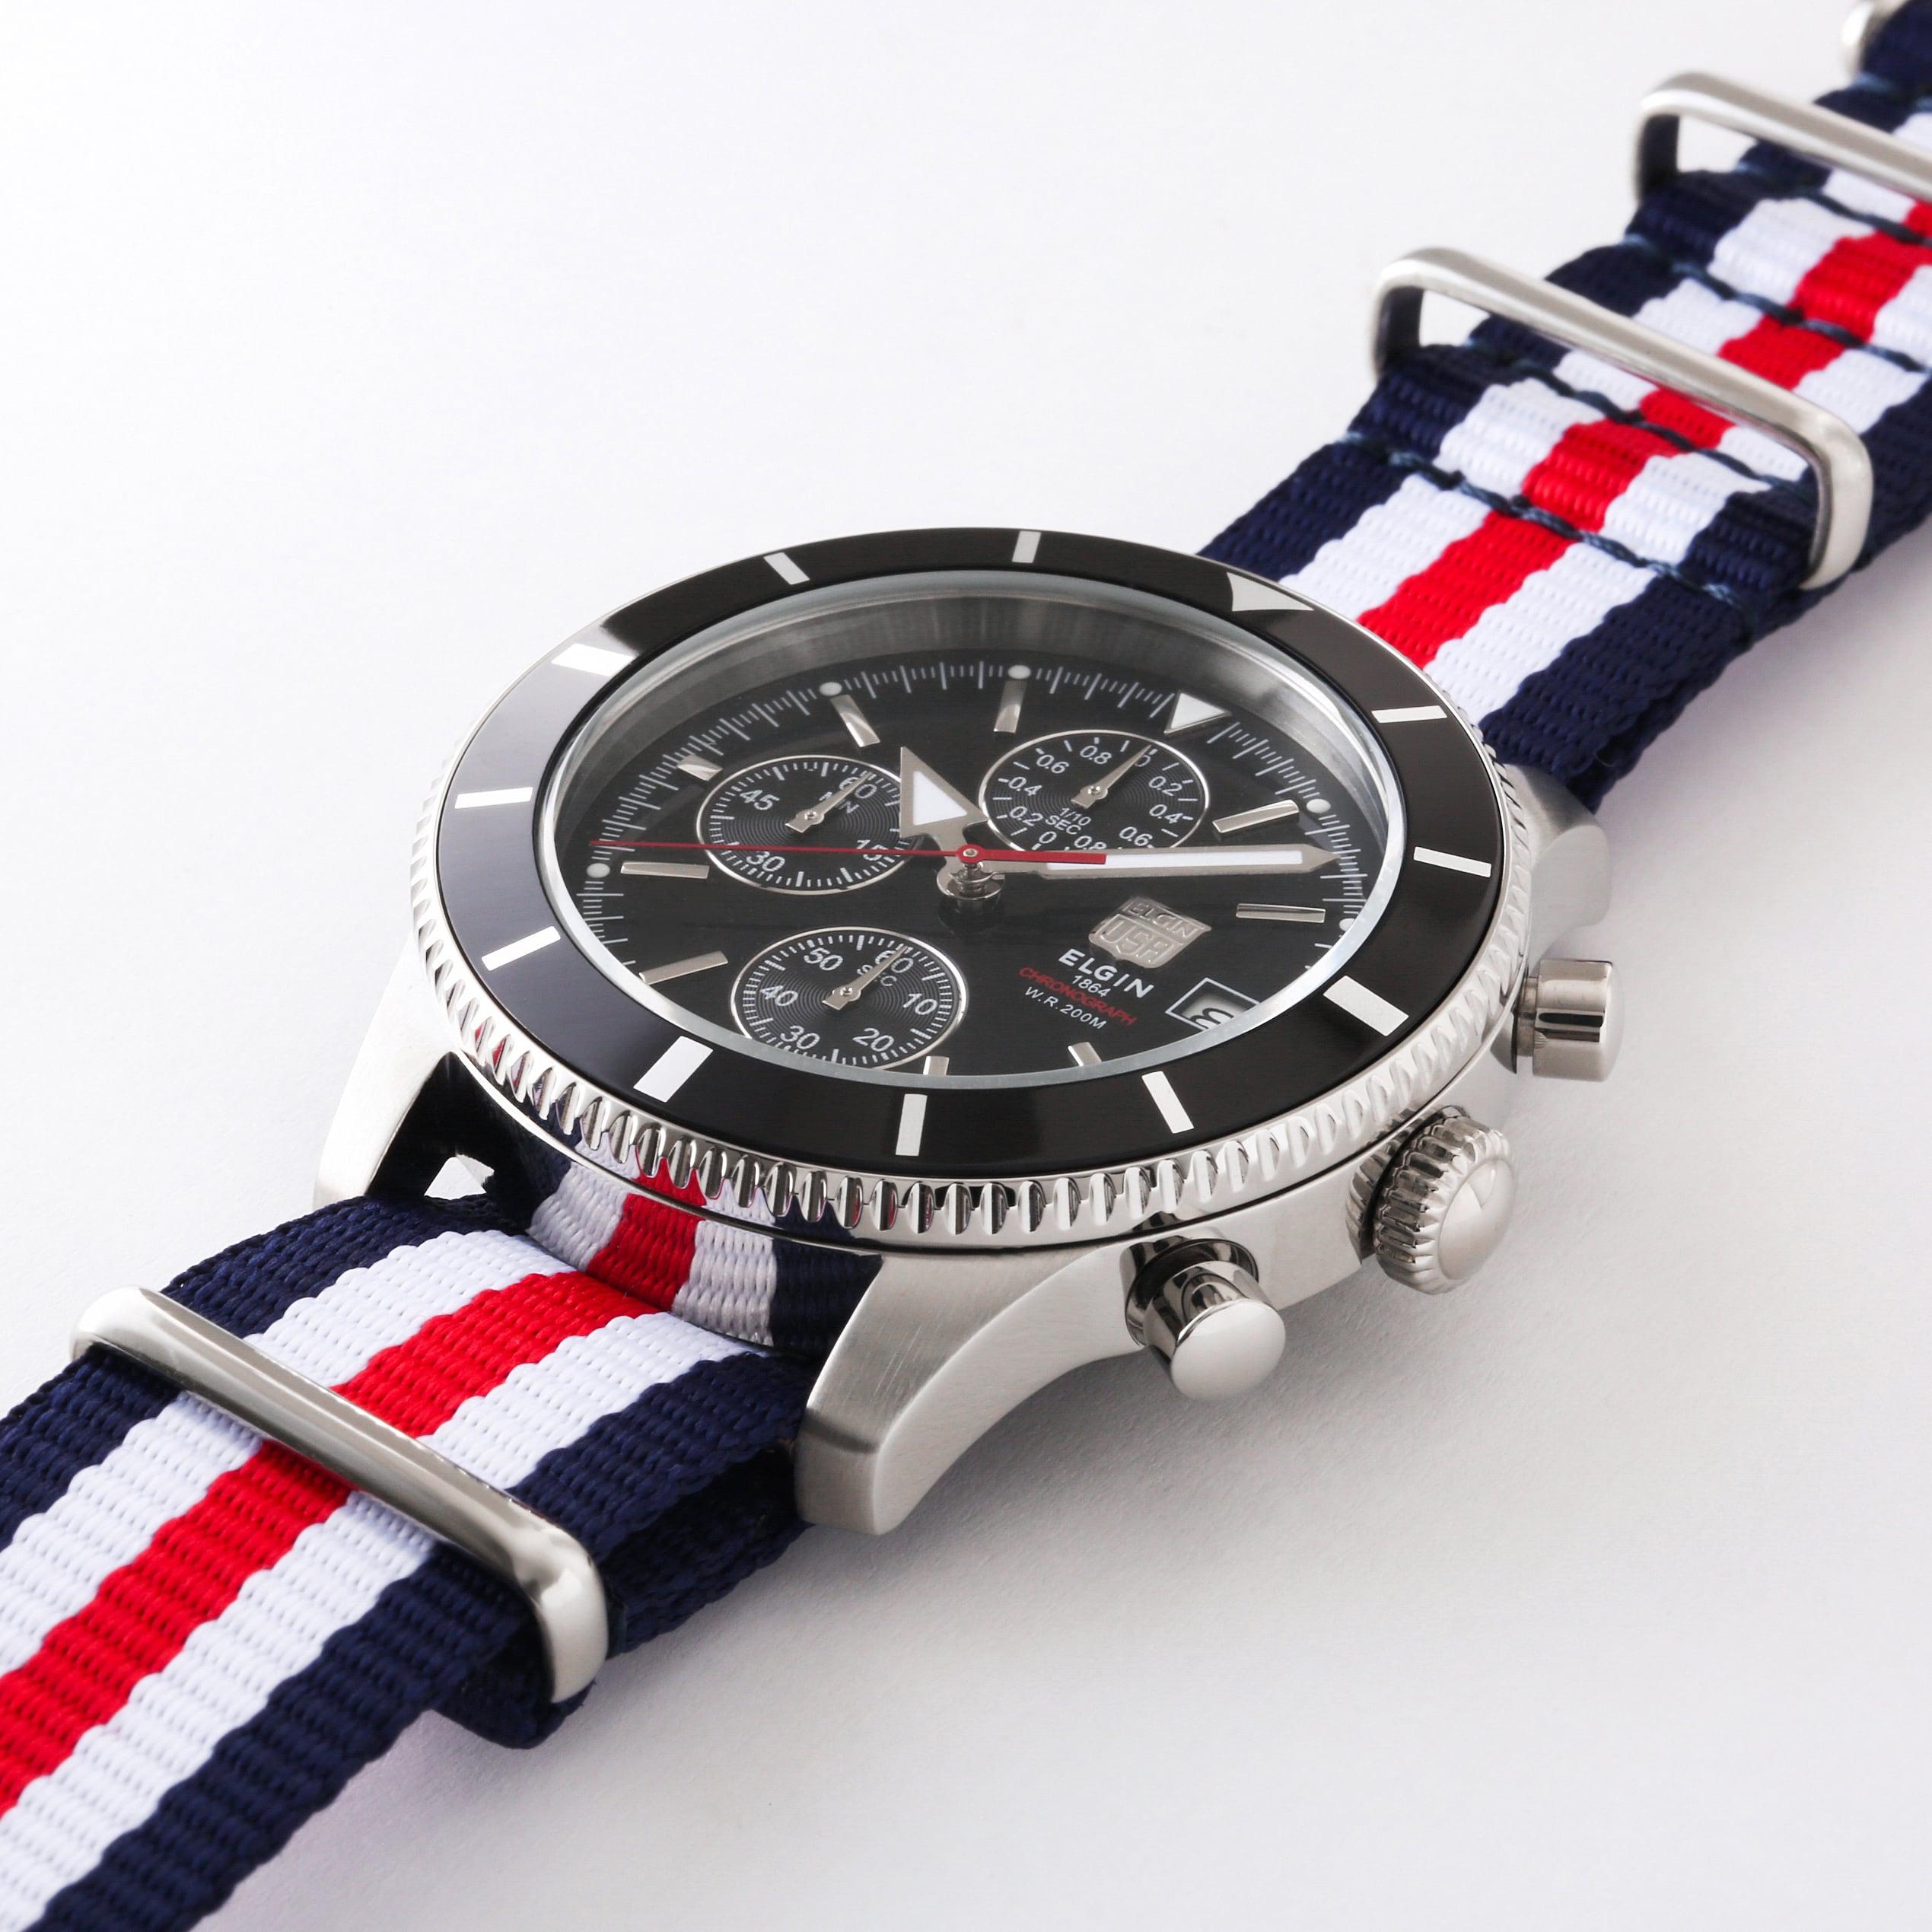 200M防水&機能的な腕時計|CB002